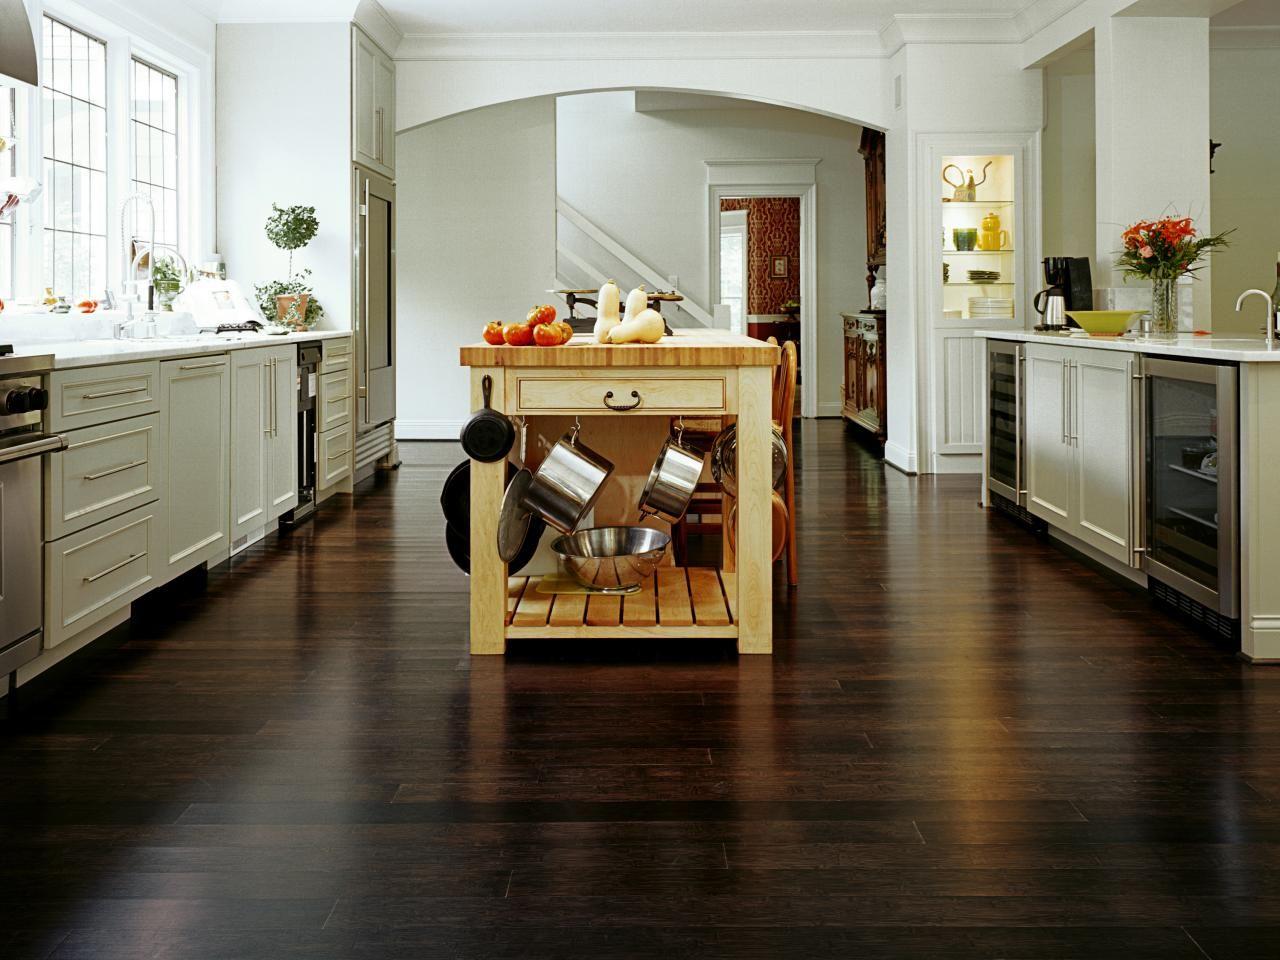 best options for kitchen flooring flooring for kitchen Kitchen bamboo flooring option